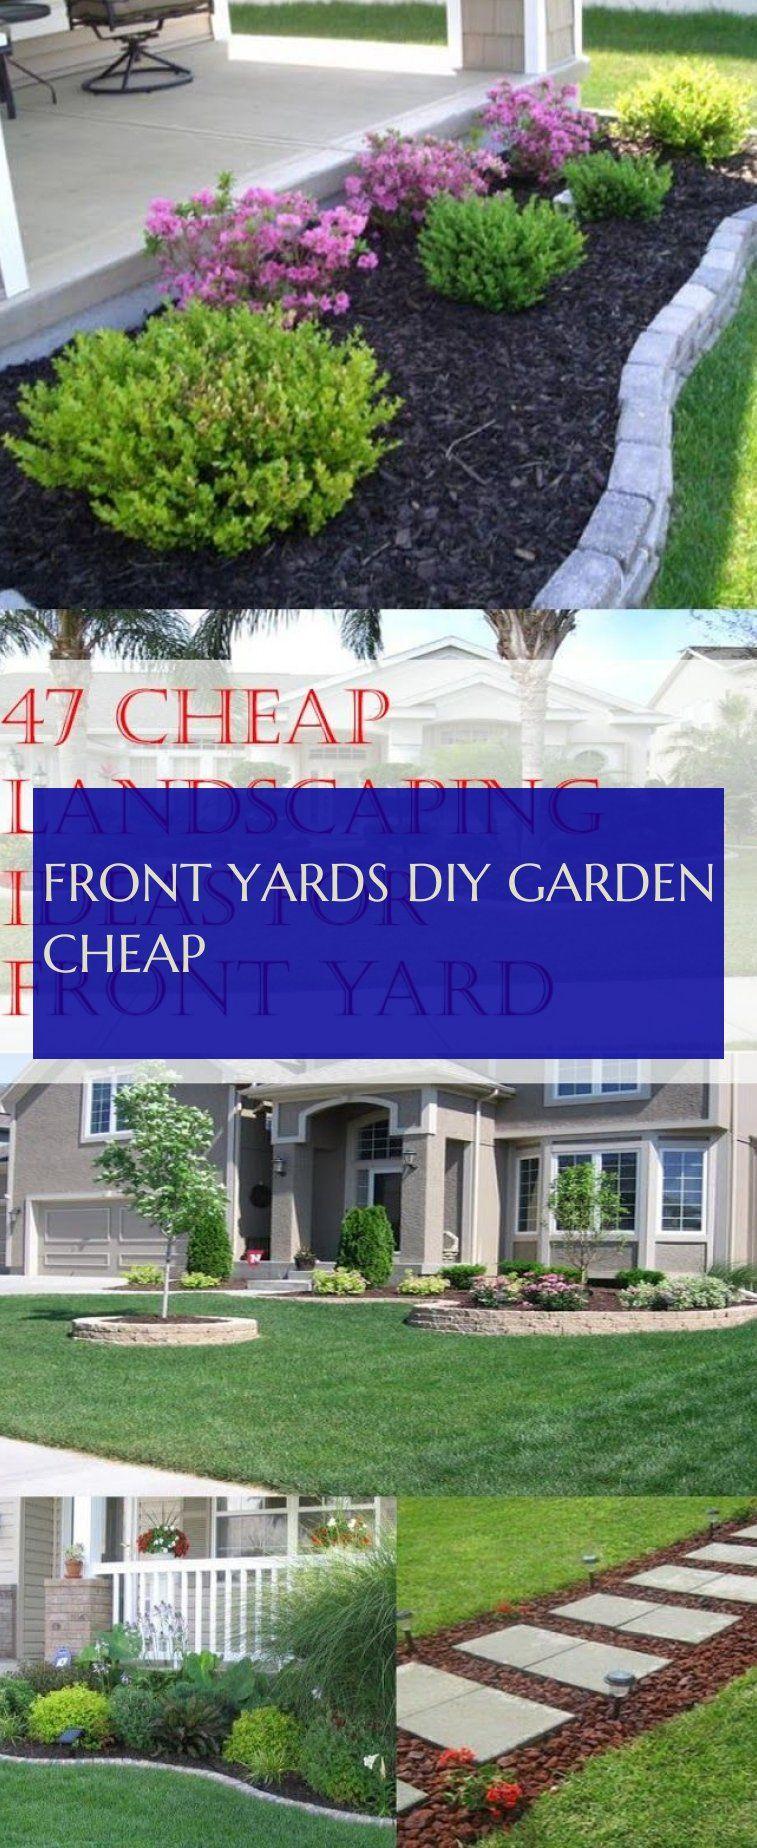 Front Yards diy garden cheap